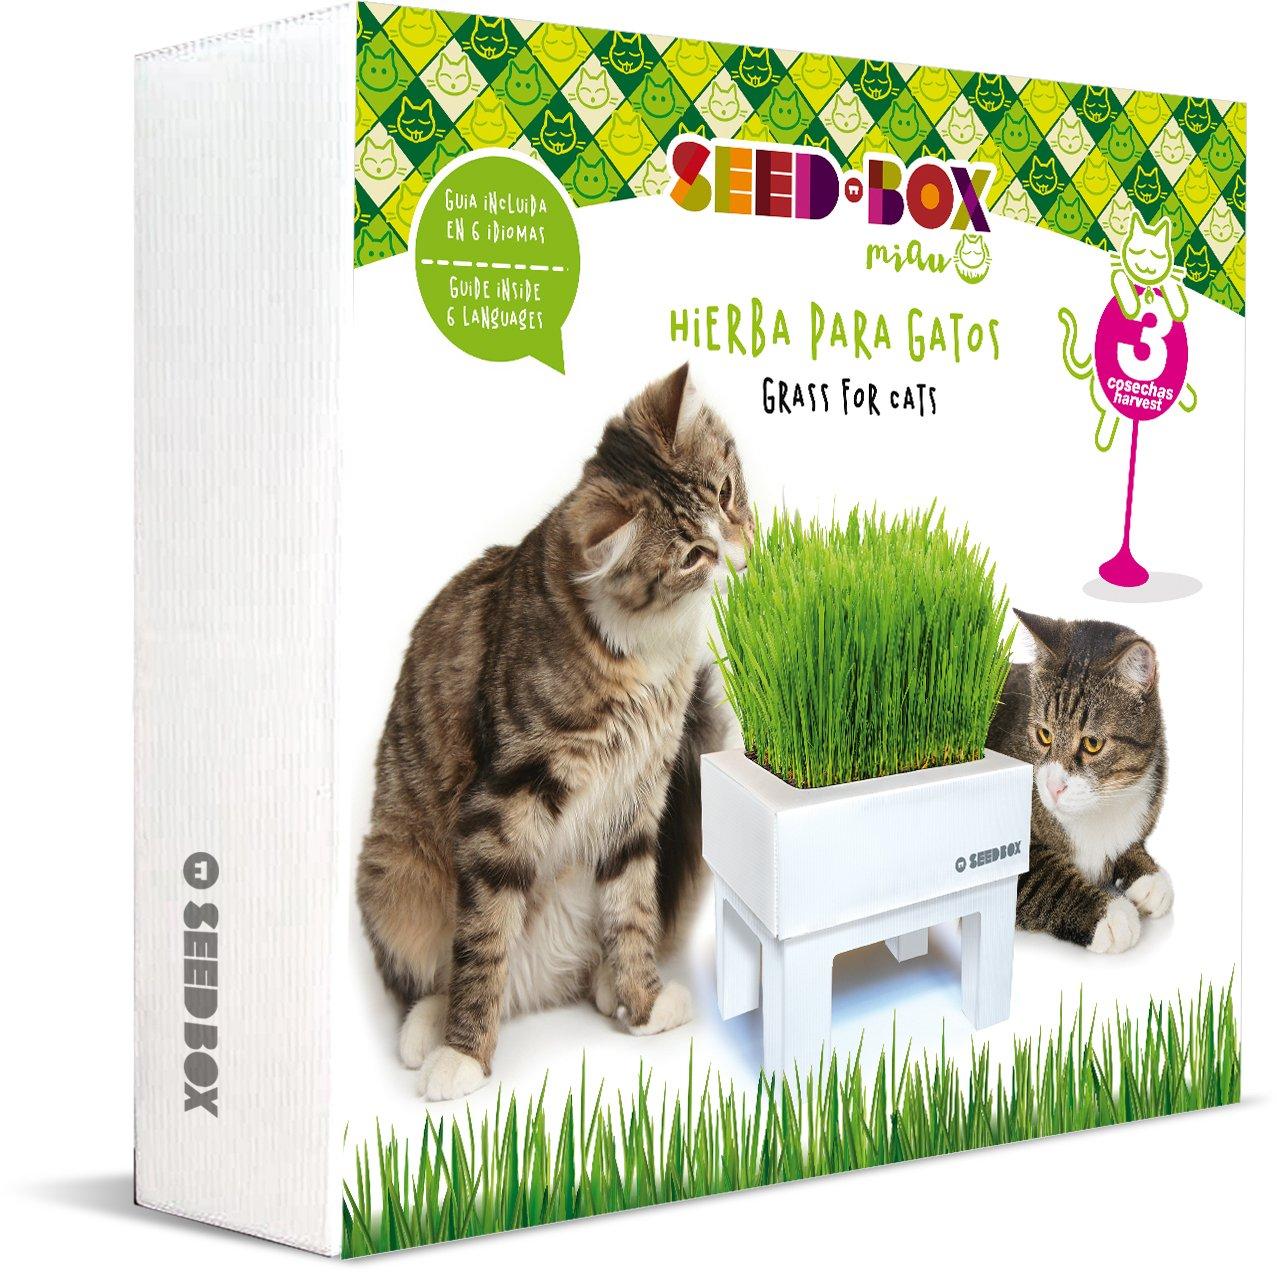 SeedBox SBMIHG Kit huerto Urbano de Hierba Blanco 20x25x25 cm: Amazon.es: Jardín